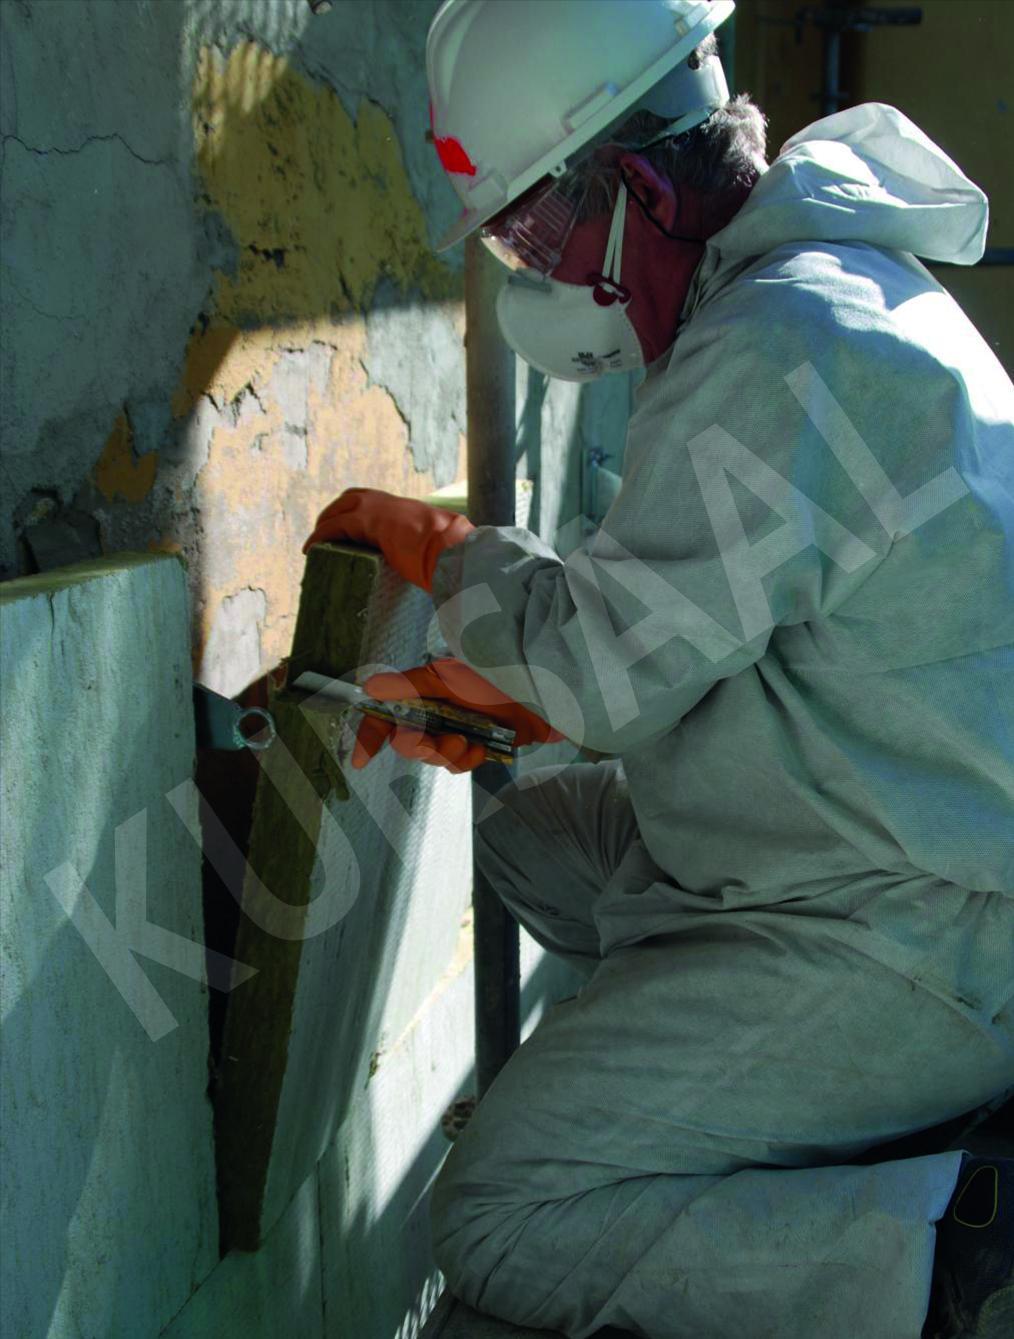 foto 4 - Aislamientos Térmicos y Eficiencia Energética-Ikastola Laskorain-TOLOSA, GIPUZKOA